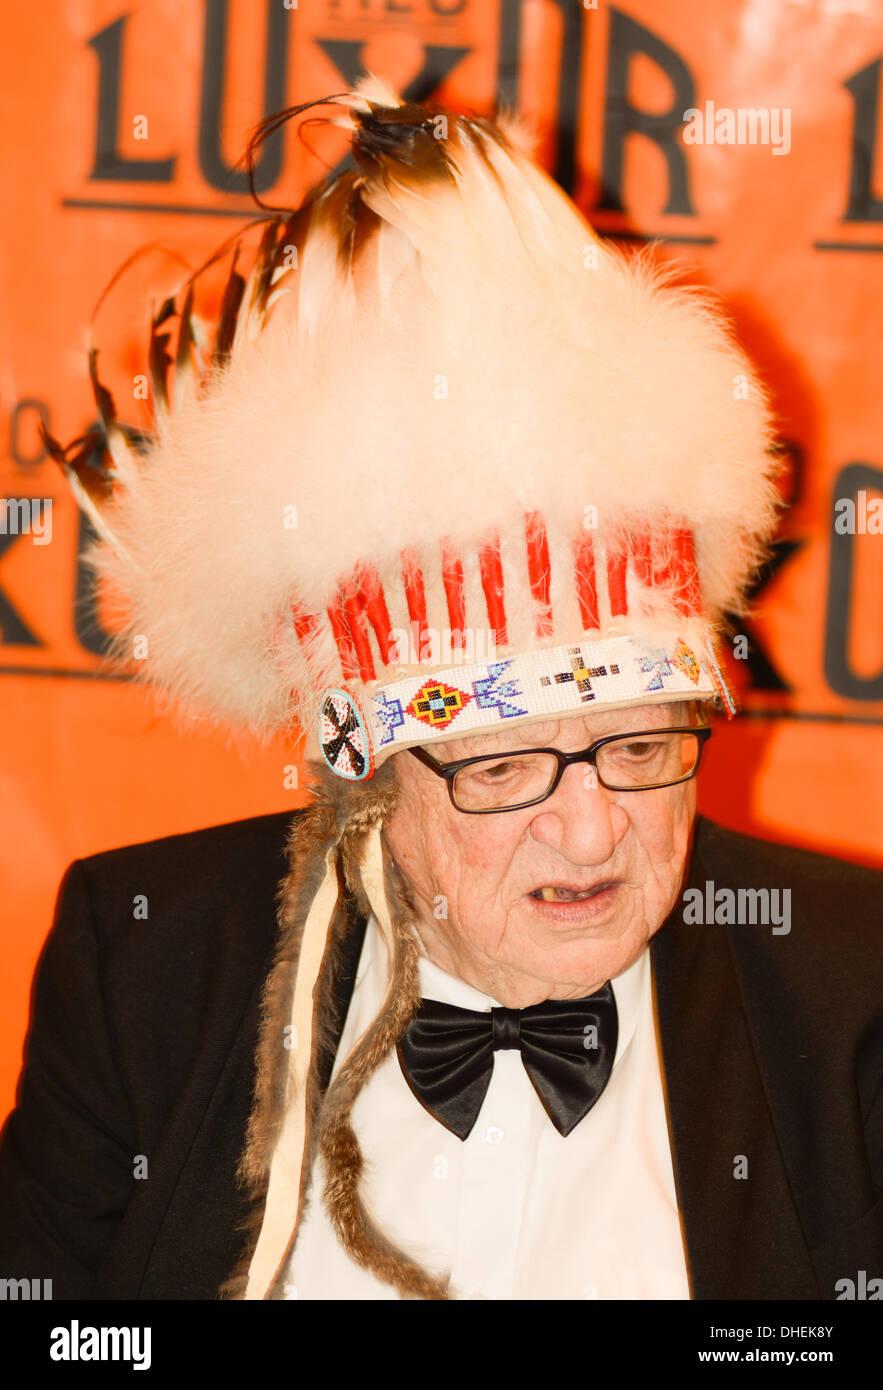 Prague, Czech Republic. 7th November 2013.  Czech traveler, ethnographer and writer Miroslav Stingl presents his new book 'Indiani na valecne stezce' ('Indians on the warpath', on November 7, 2013, in Prague, Czech Republic. Credit:  Radek Detinsky/Alamy Live News - Stock Image